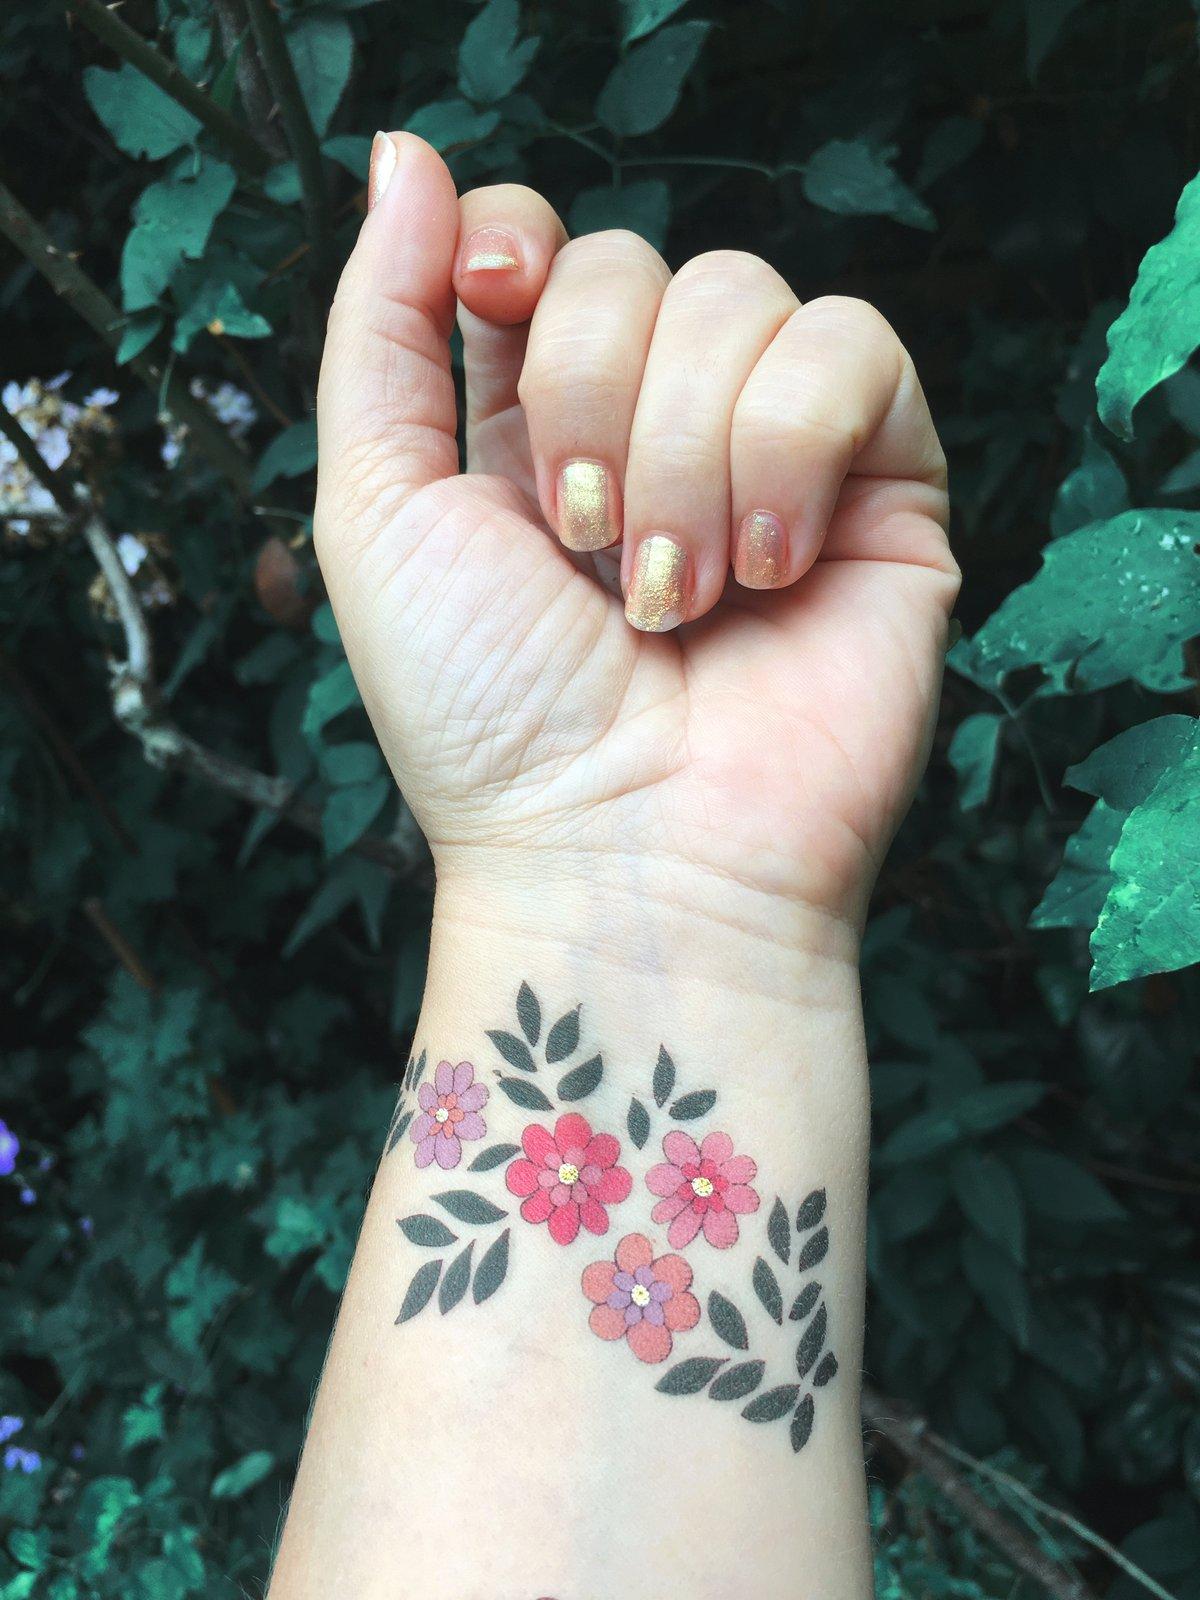 **NEW** Victorian Jewellery A5 Temporary Tattoos